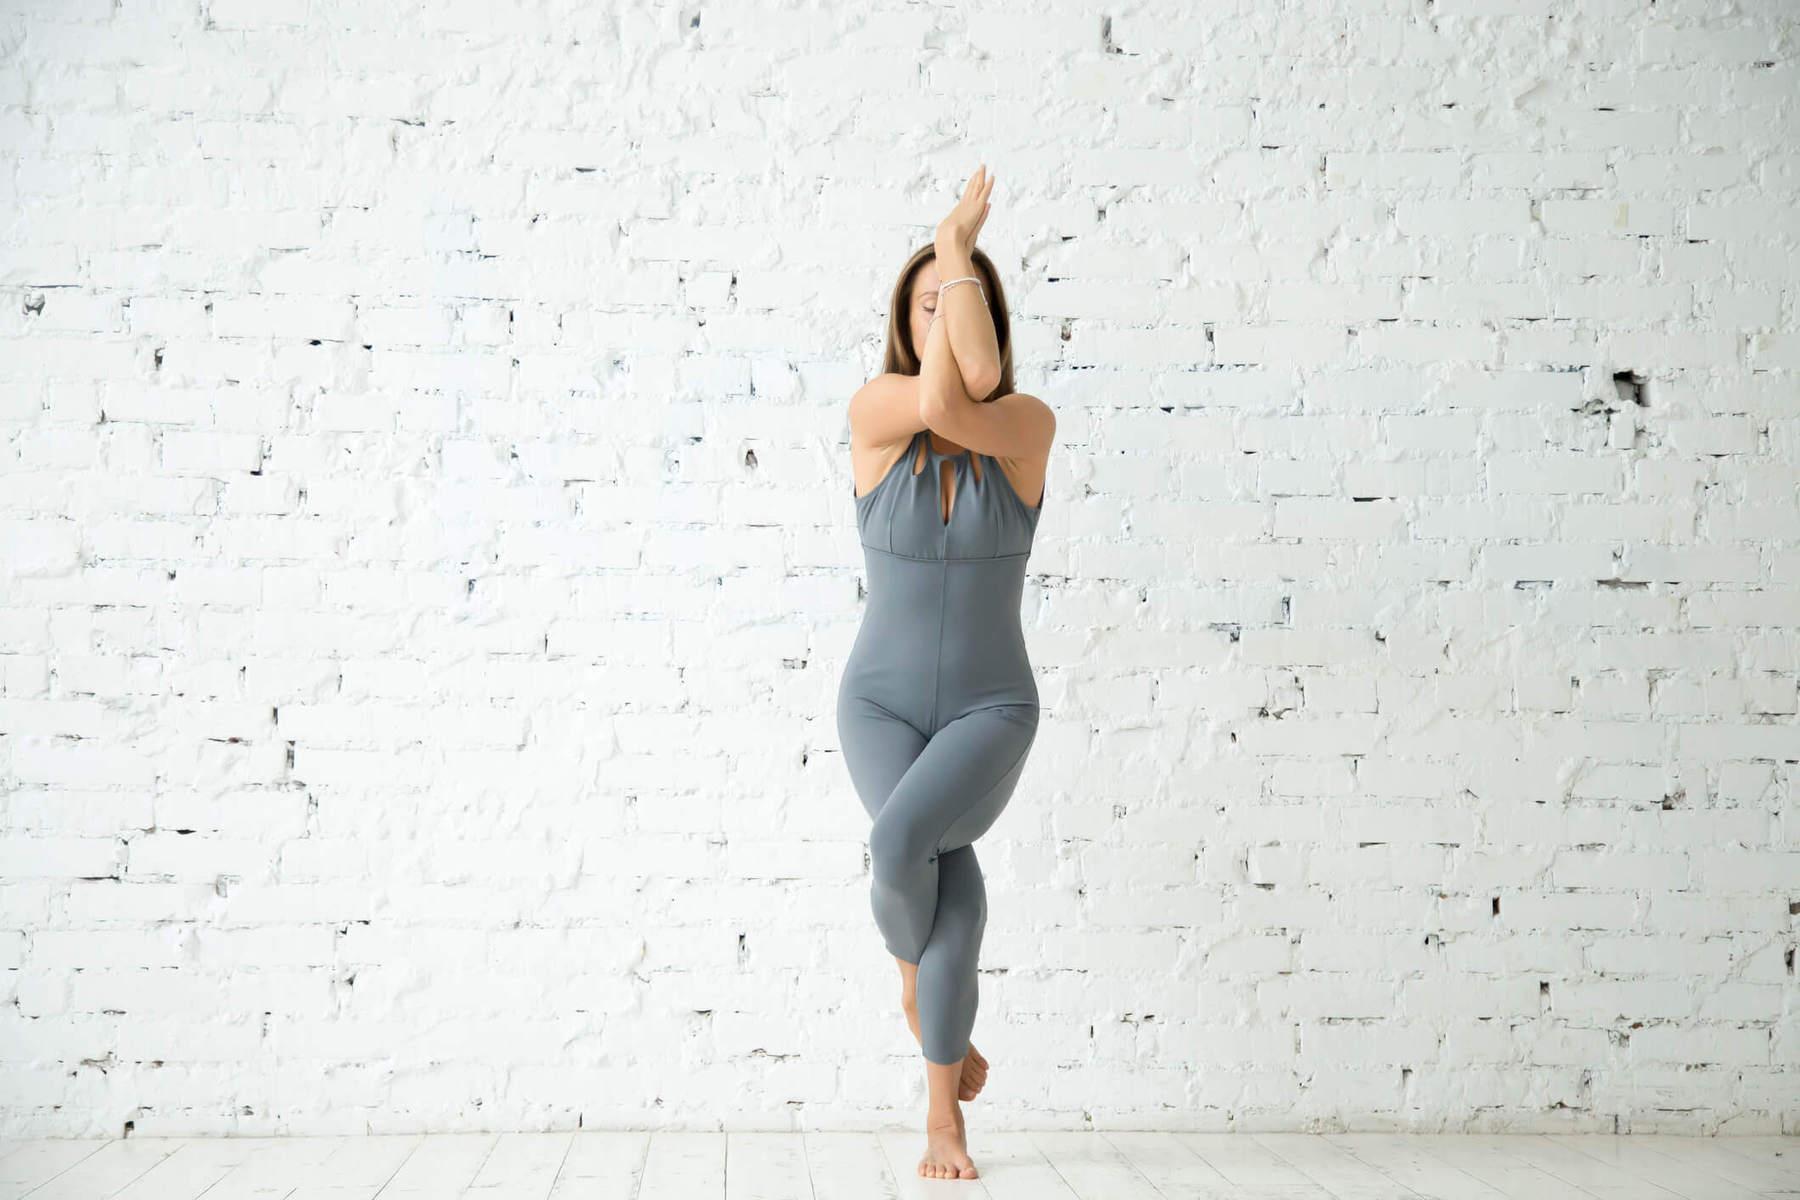 garudasana, garudasana pose, garudasana posture, garudasana asana, Bikram, Bikram Yoga, Bikram poses, Bikram yoga poses, yoga, avaanawellbeing, avaana